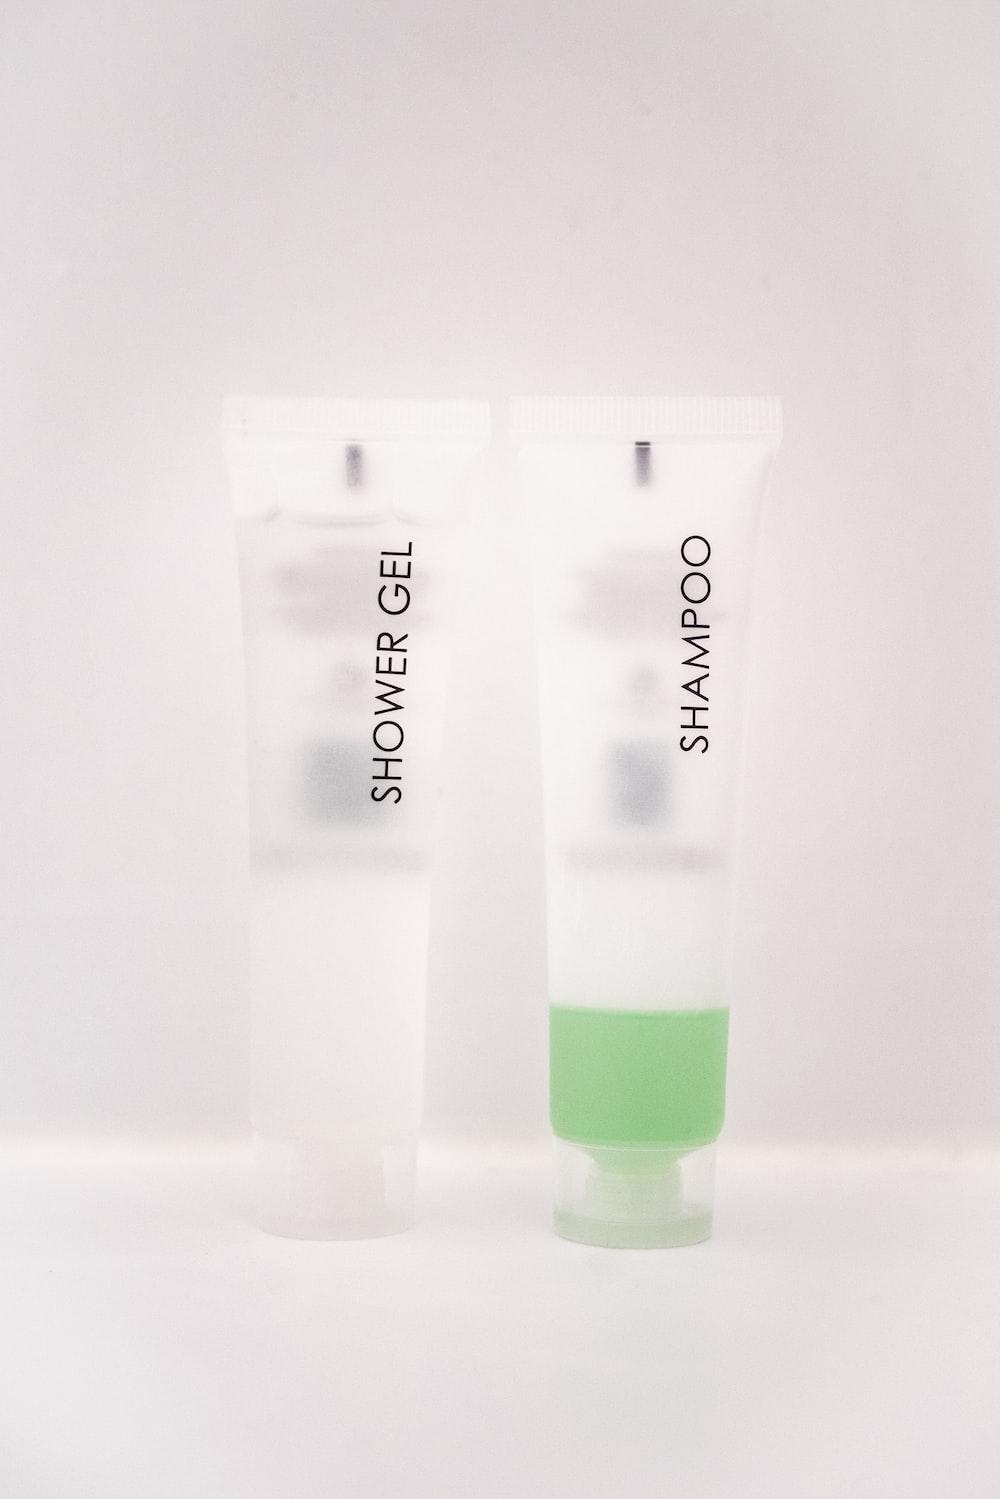 shower gel and shampoo soft-tube bottles on white surface